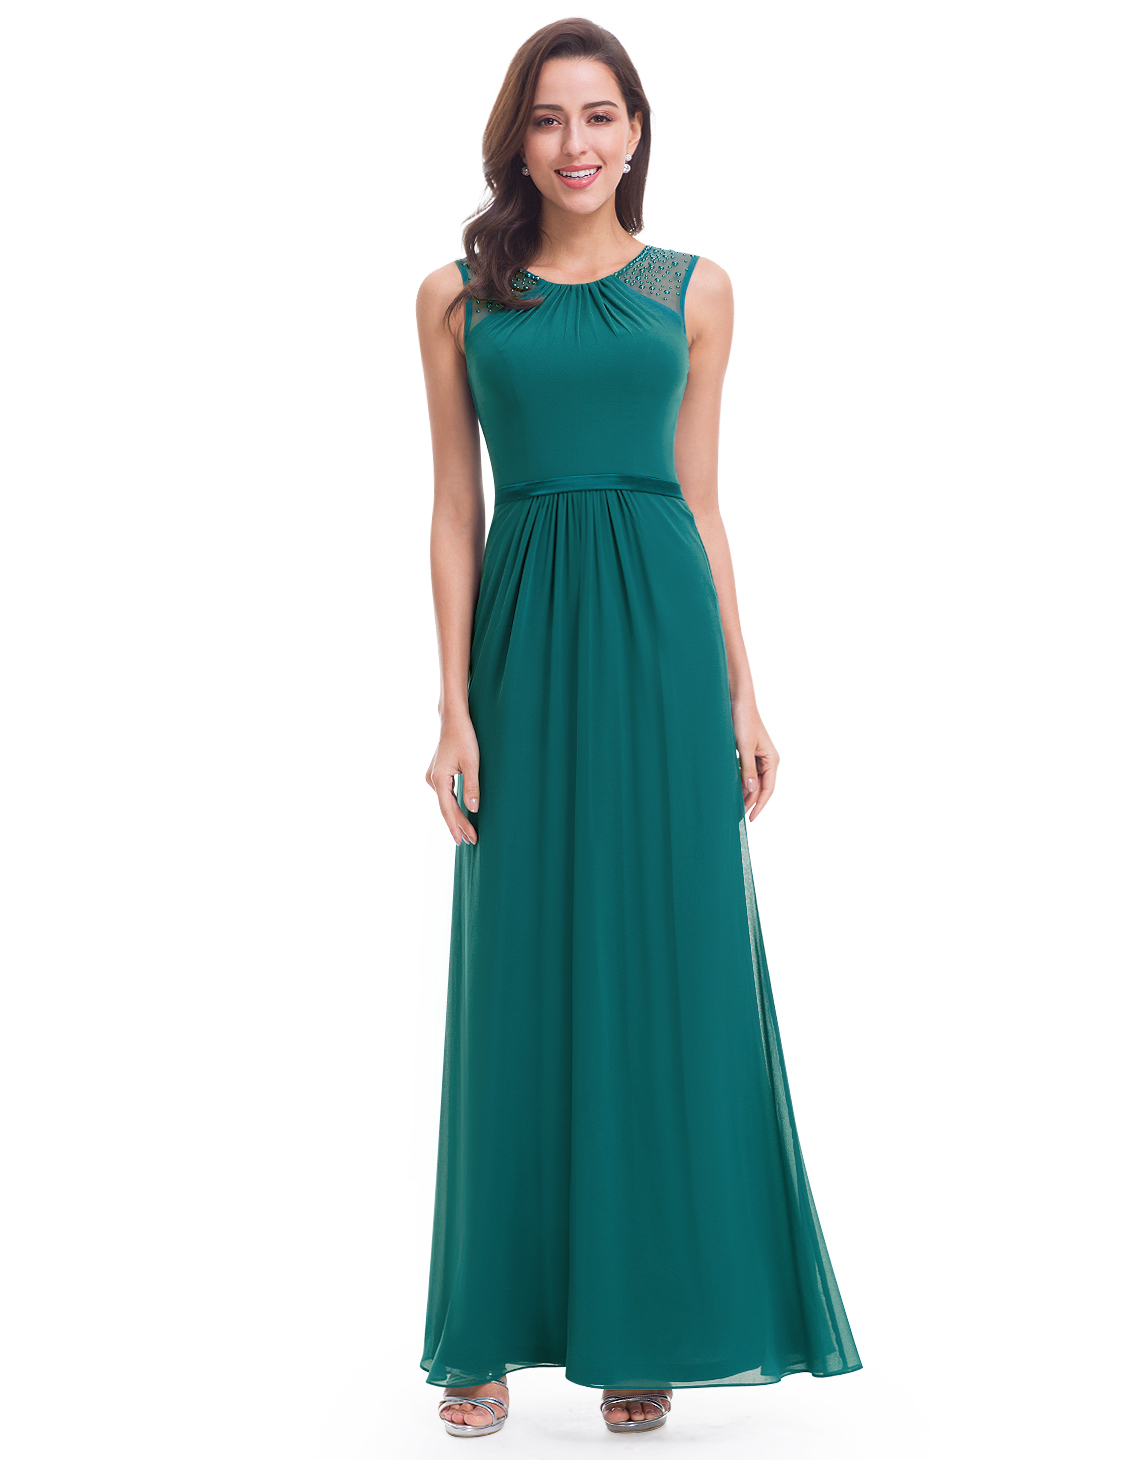 Ever-Pretty Bridesmaid Dresses Long Chiffon Evening Party Ball Dresses 08742 | EBay